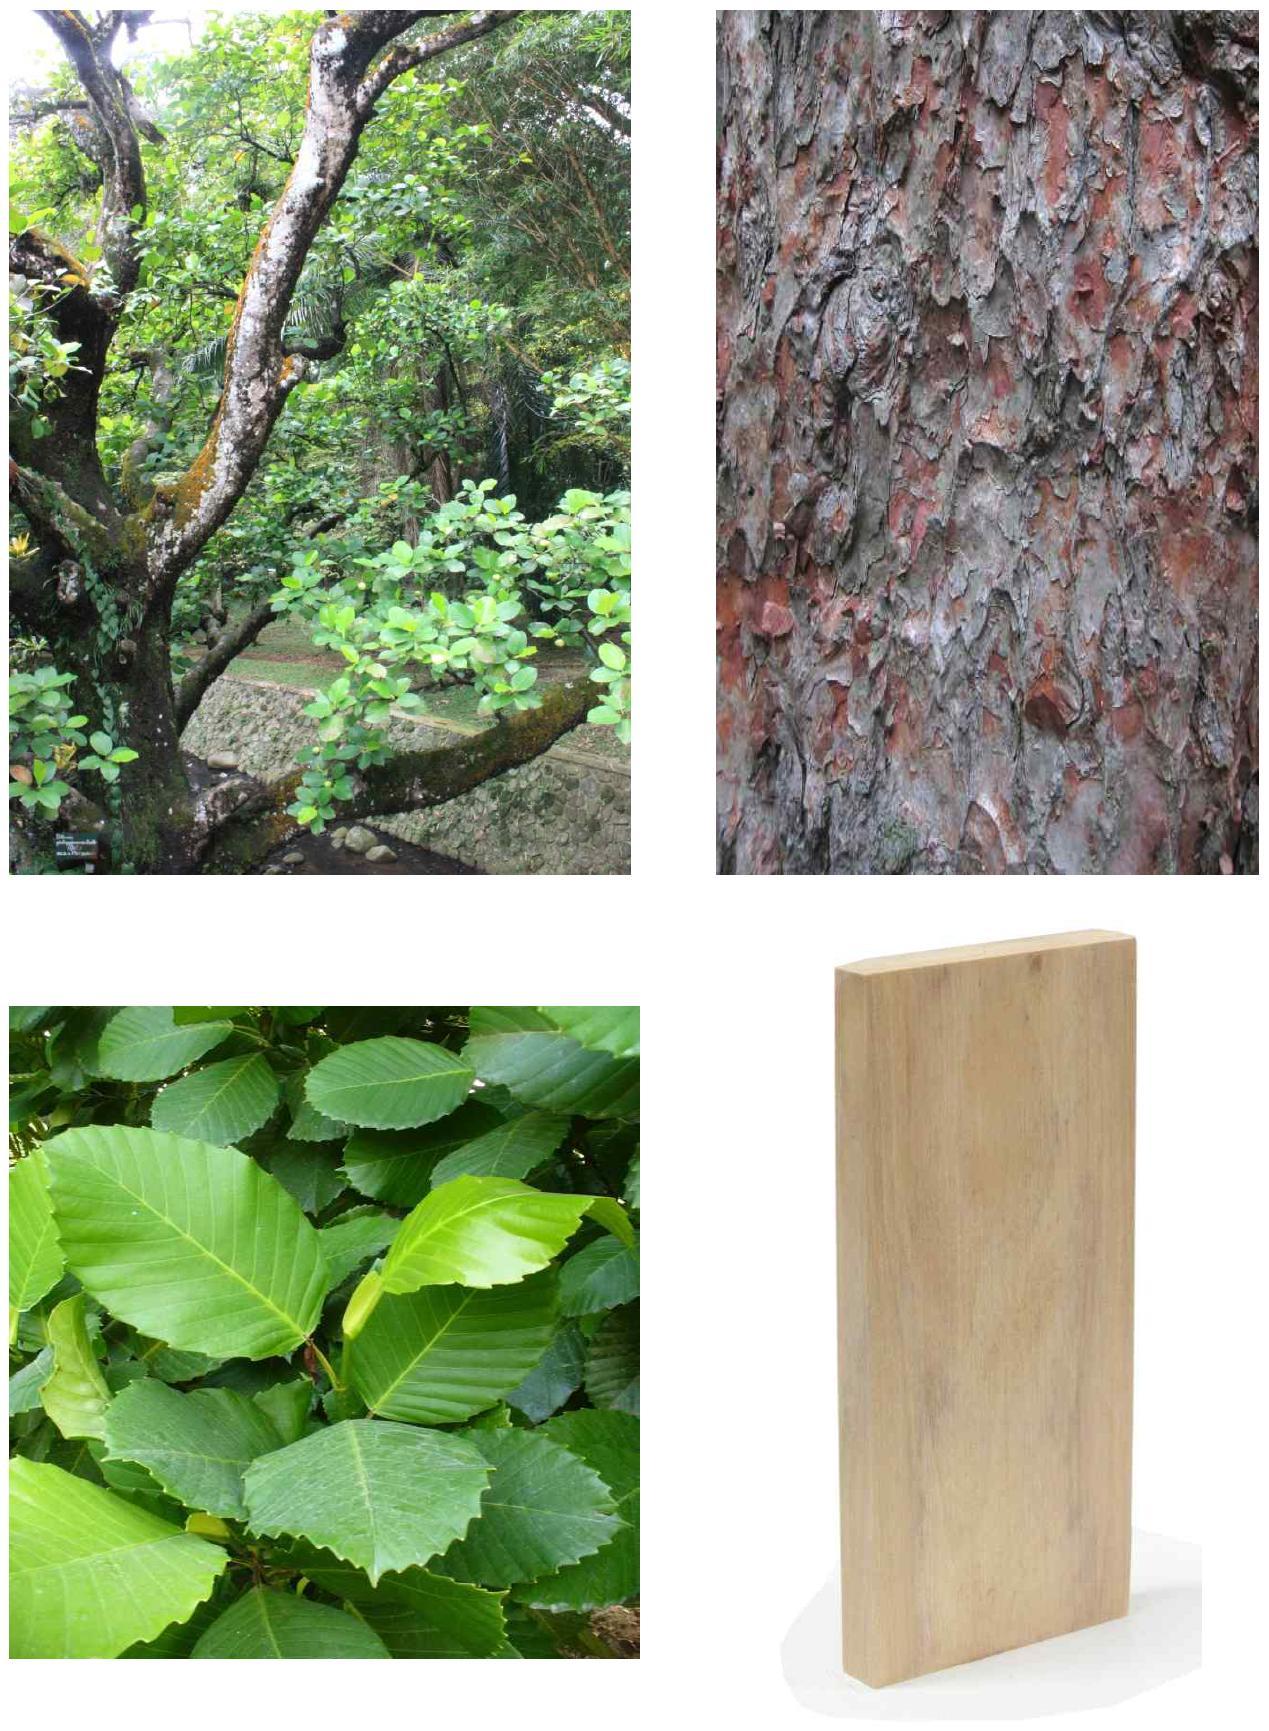 Simpur batu의 전체수형, 수피, 잎 및 재면.